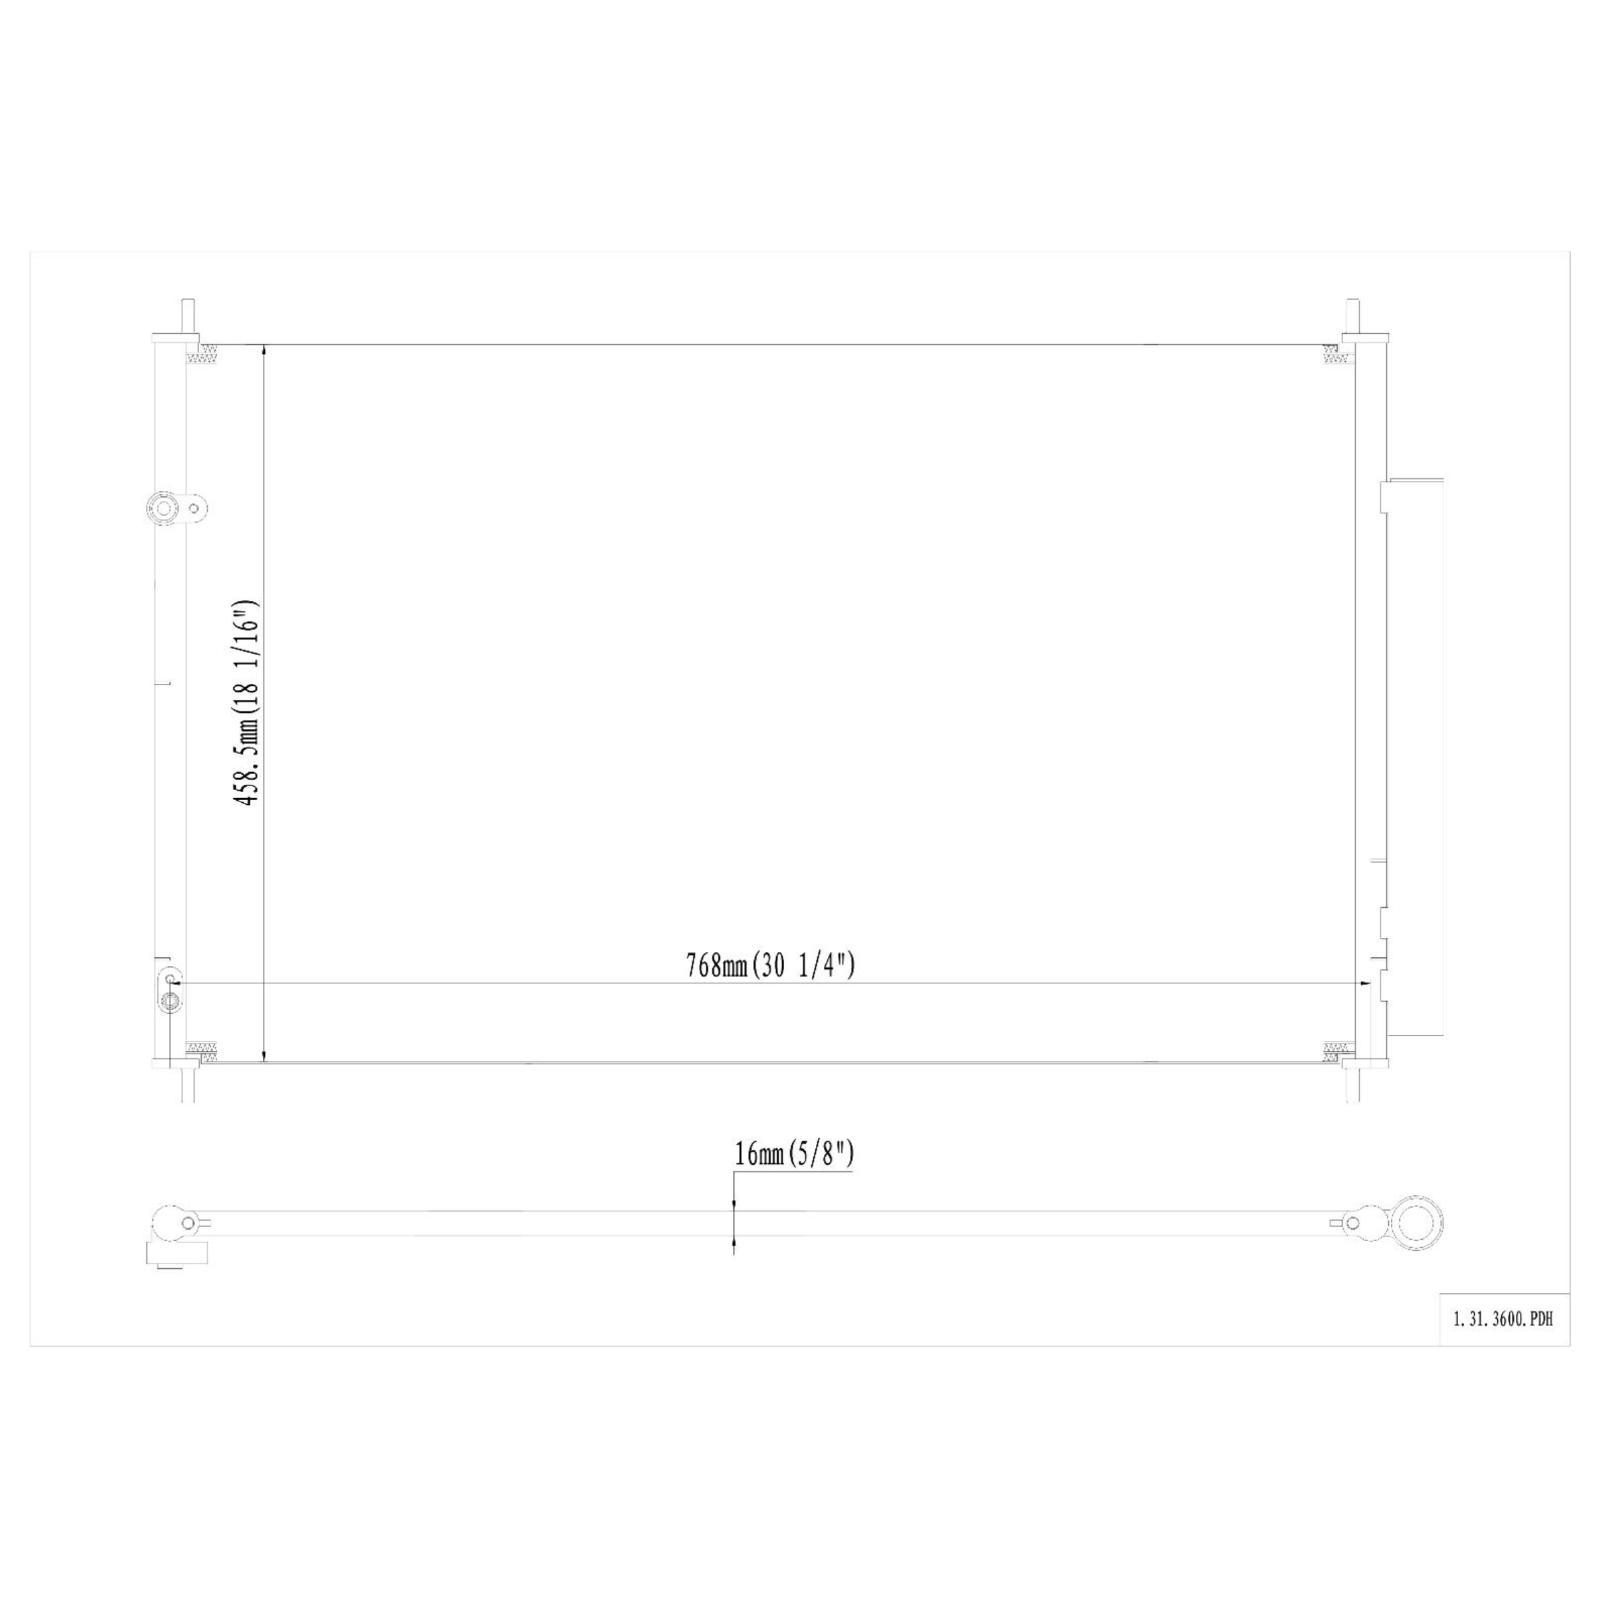 All Aluminum Condenser For 2007-2012 Acura MDX 3.7L 2010